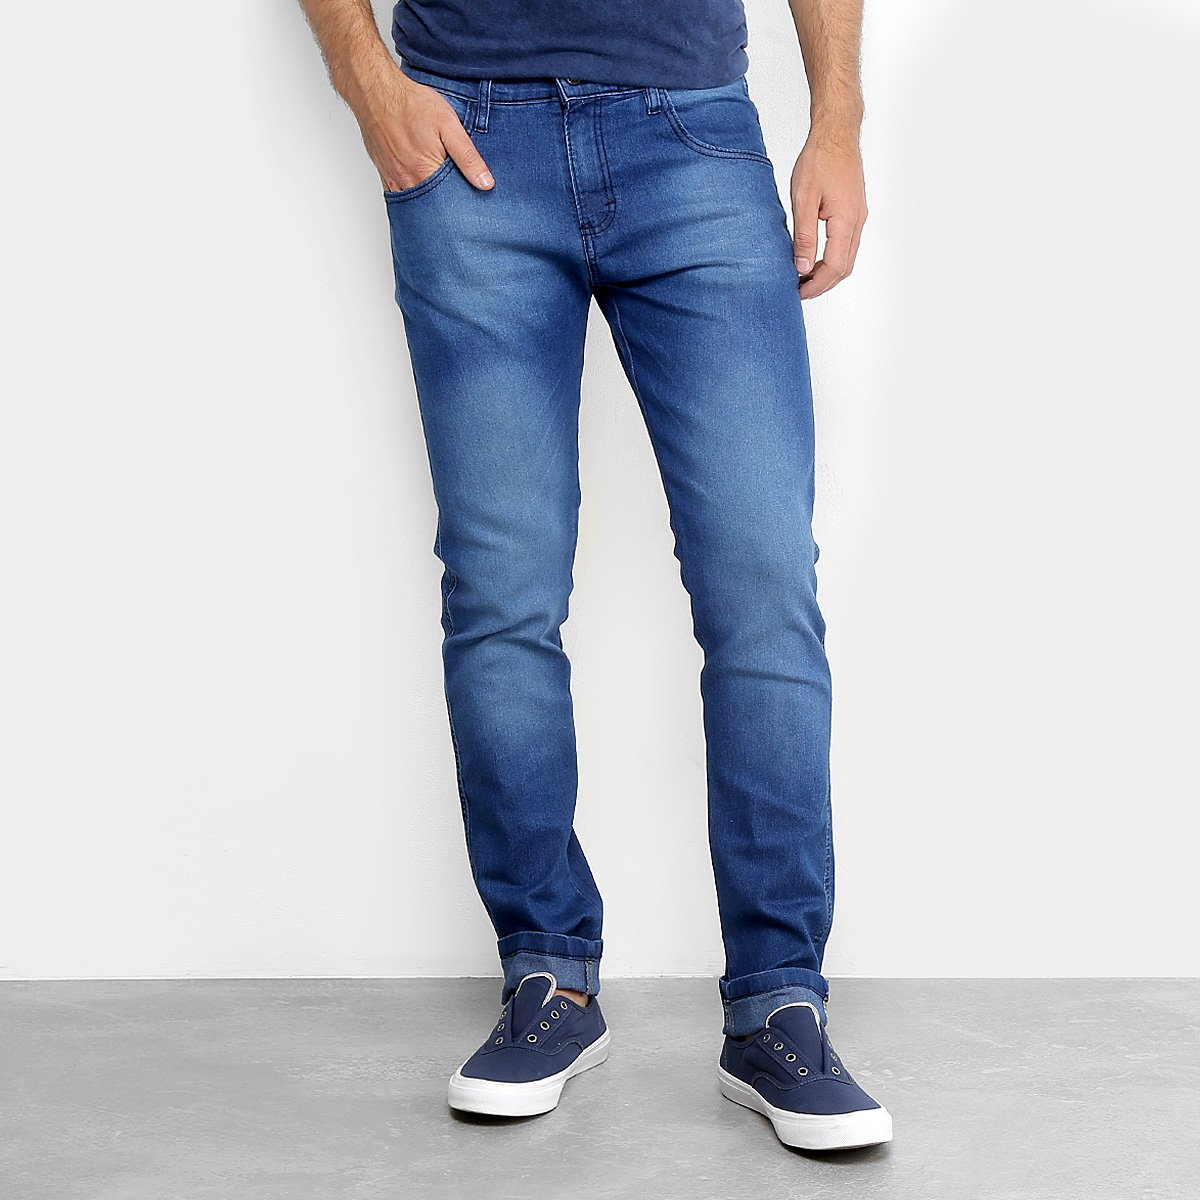 b604bfd92a Calça Jeans Slim Zamany Elastano Masculina | Netshoes